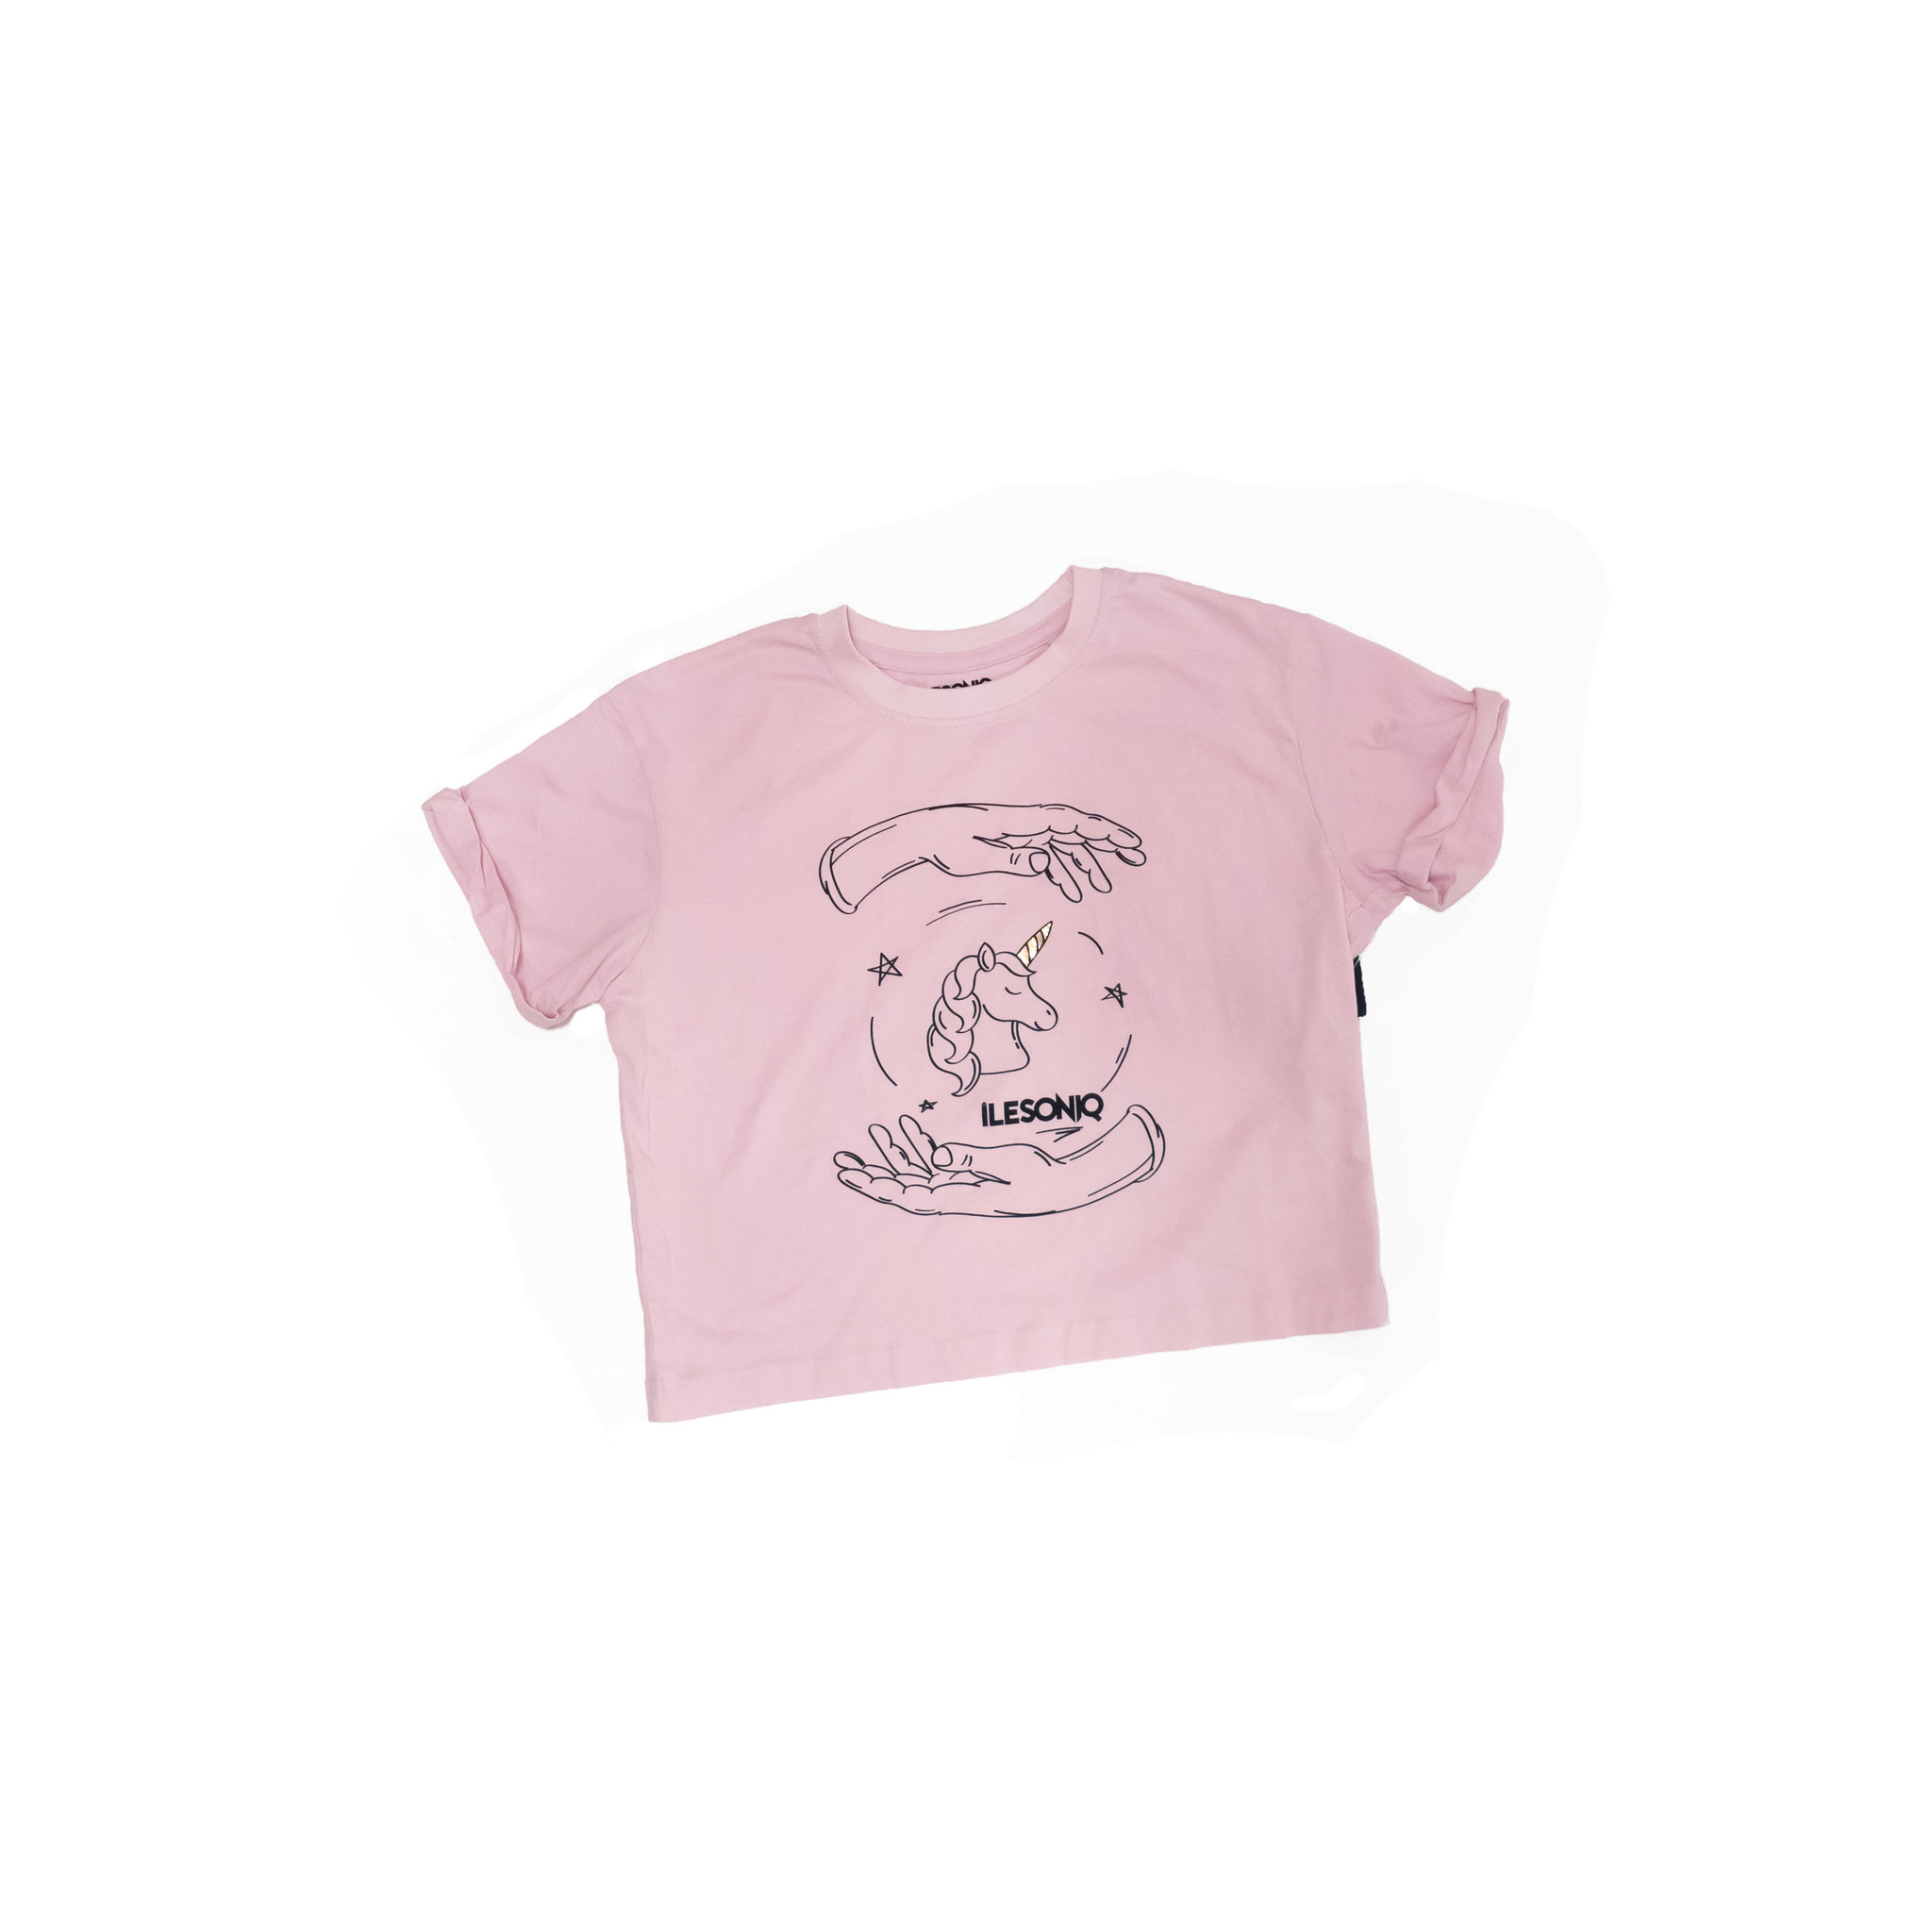 Ile Soniq TFIS18CL0001 -  T-shirt femme crop top